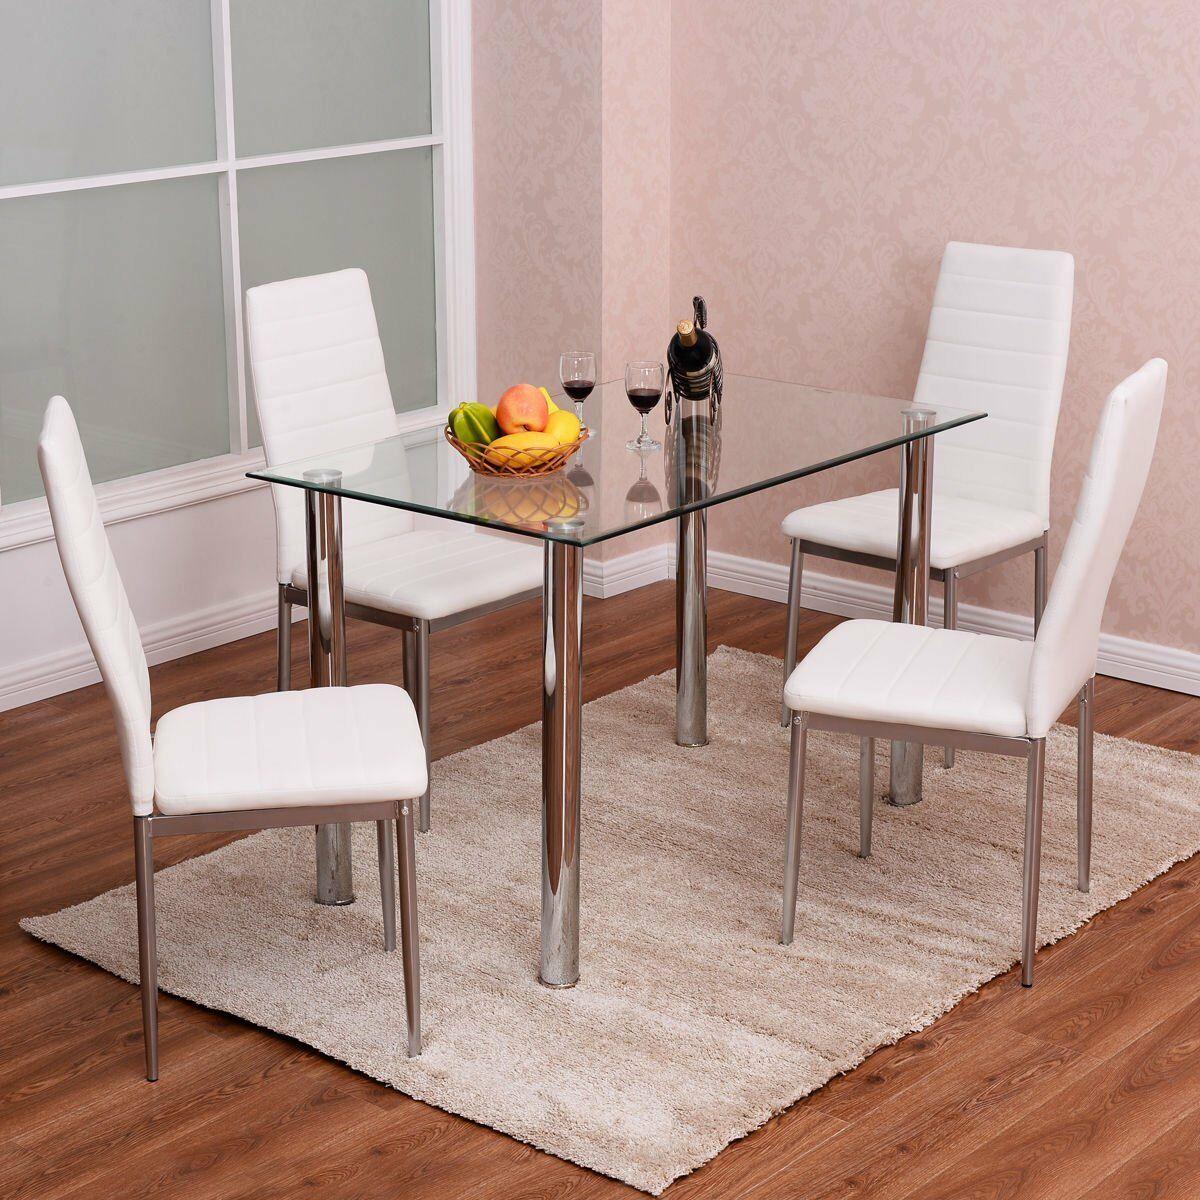 5 Piece Dining Table Set Glass Steel W 4 Chairs Kitchen Room Breakfast Furniture Ebay